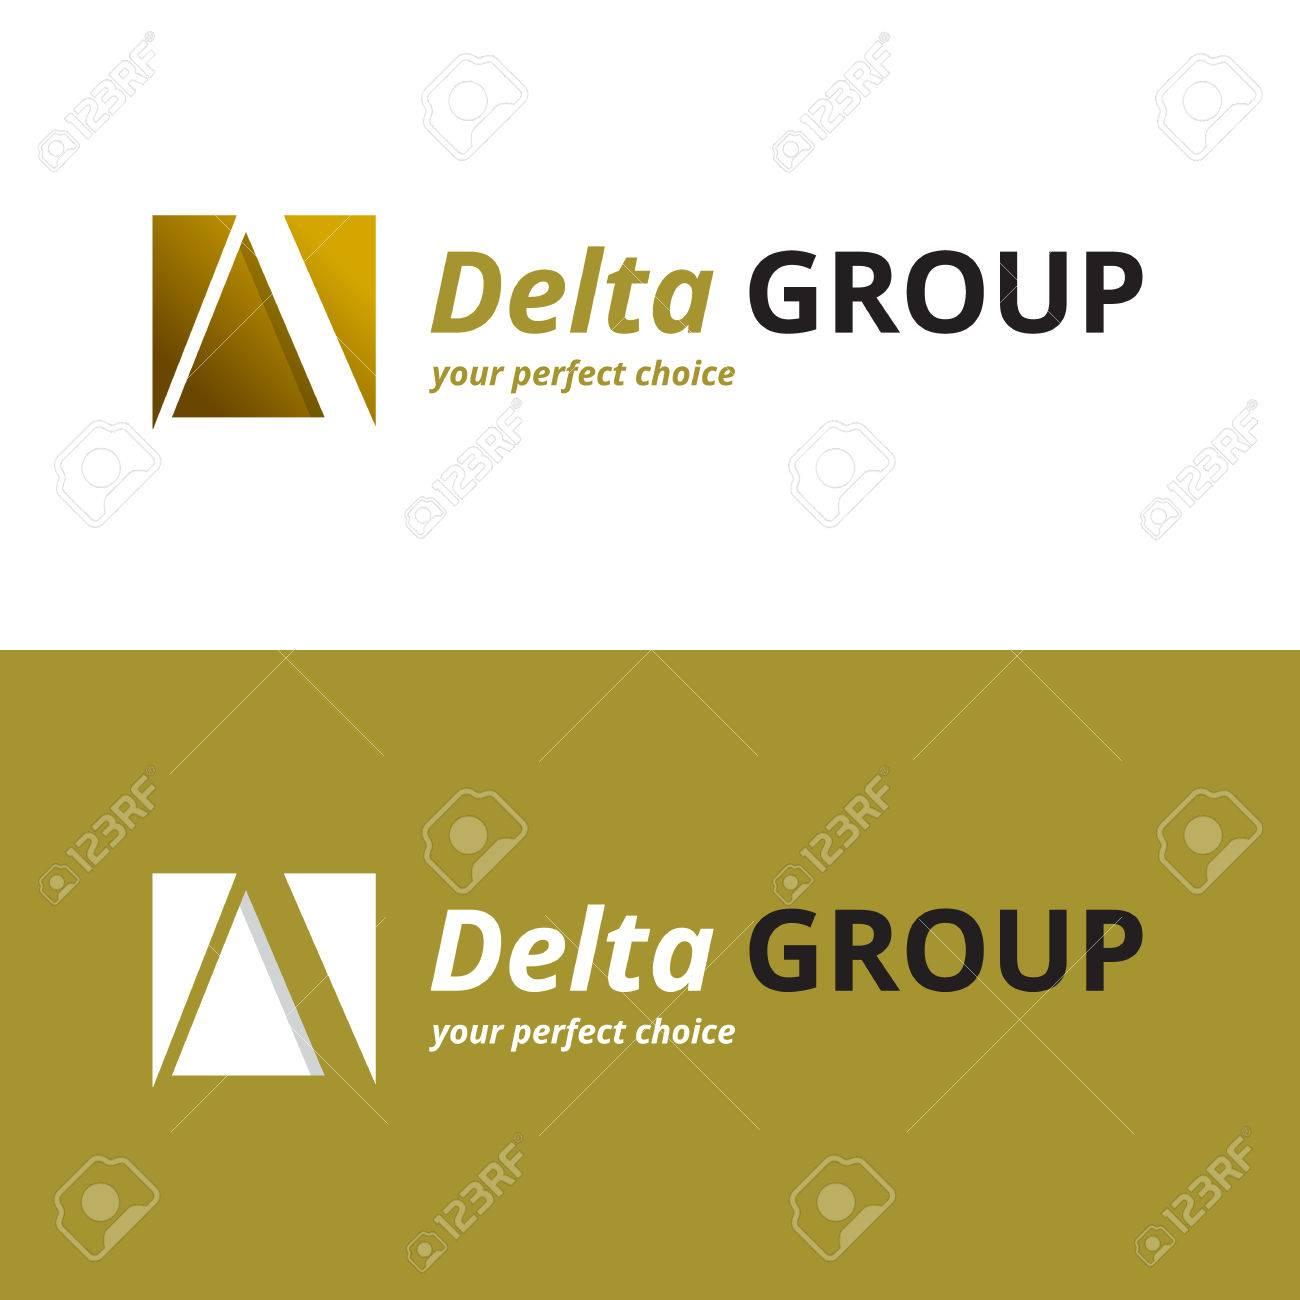 Vector minimalistic negative space greek letter logo delta letter vector minimalistic negative space greek letter logo delta letter symbol stock vector 55495531 biocorpaavc Choice Image